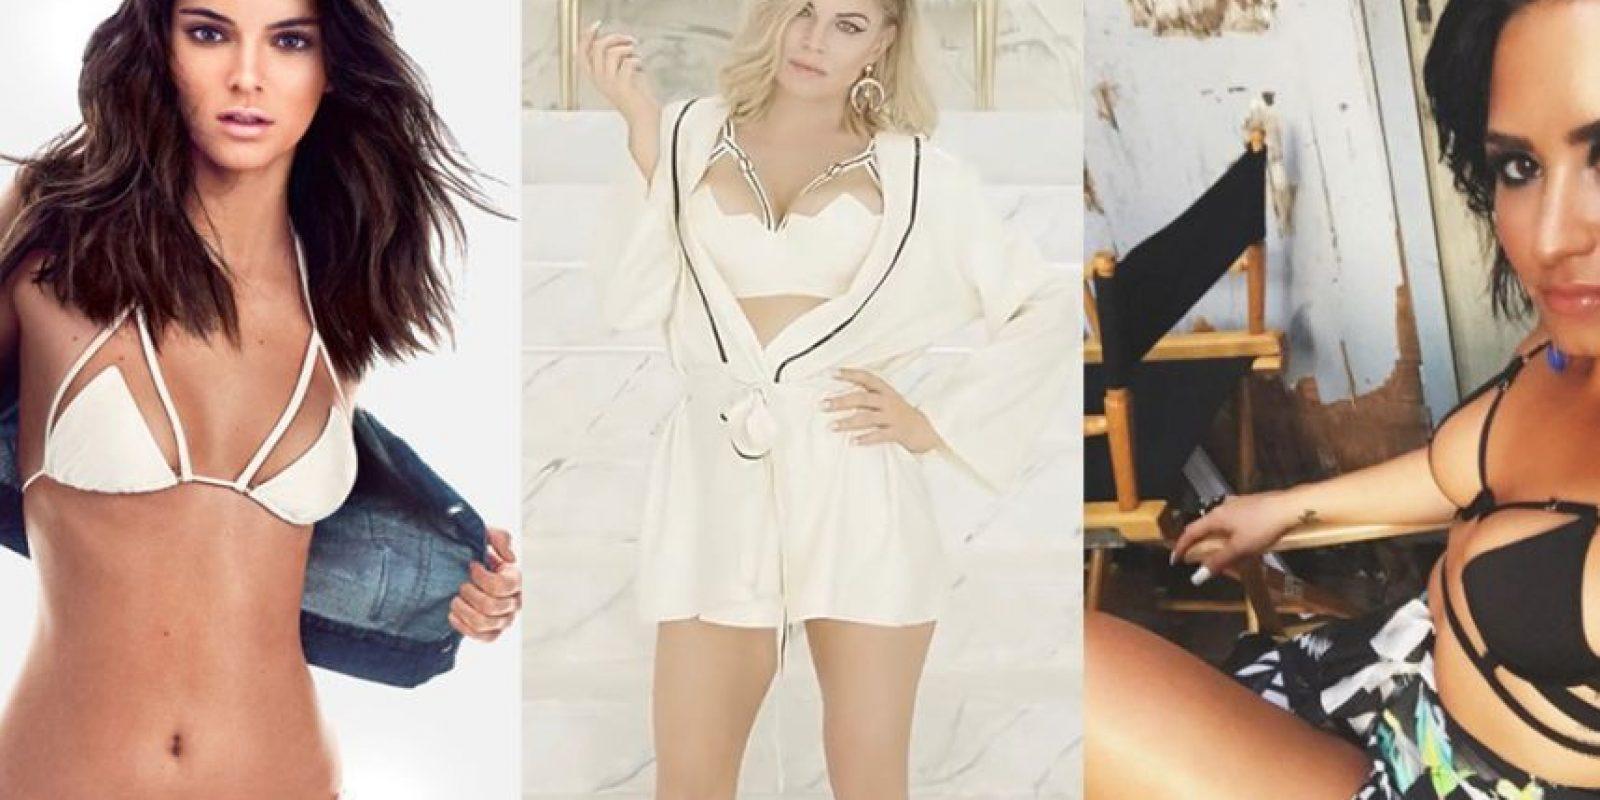 Kendall Jenner, Fergie y Demi Lovato Foto:GQ Magazine, Vevo, Instagram @DemiLovato